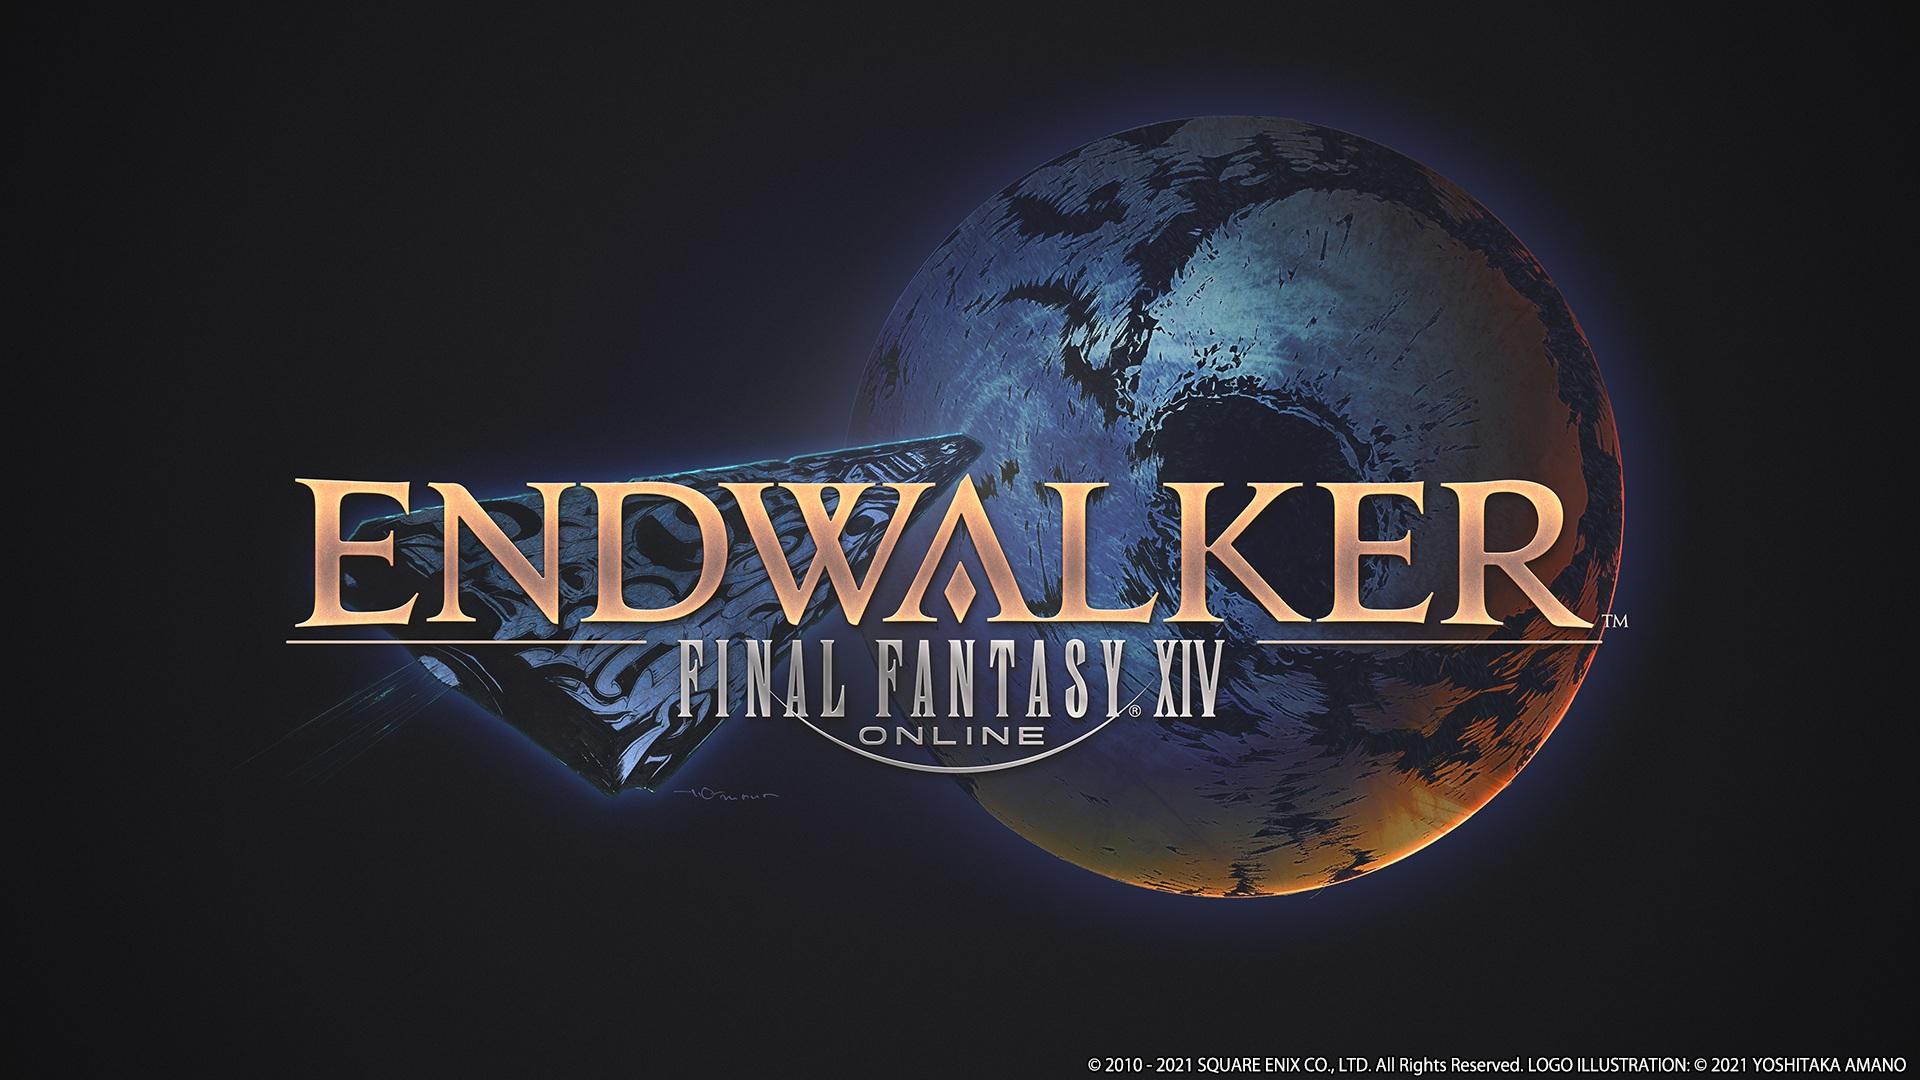 Annunciata Endwalker, la nuova espansione di Final Fantasy XIV Online!